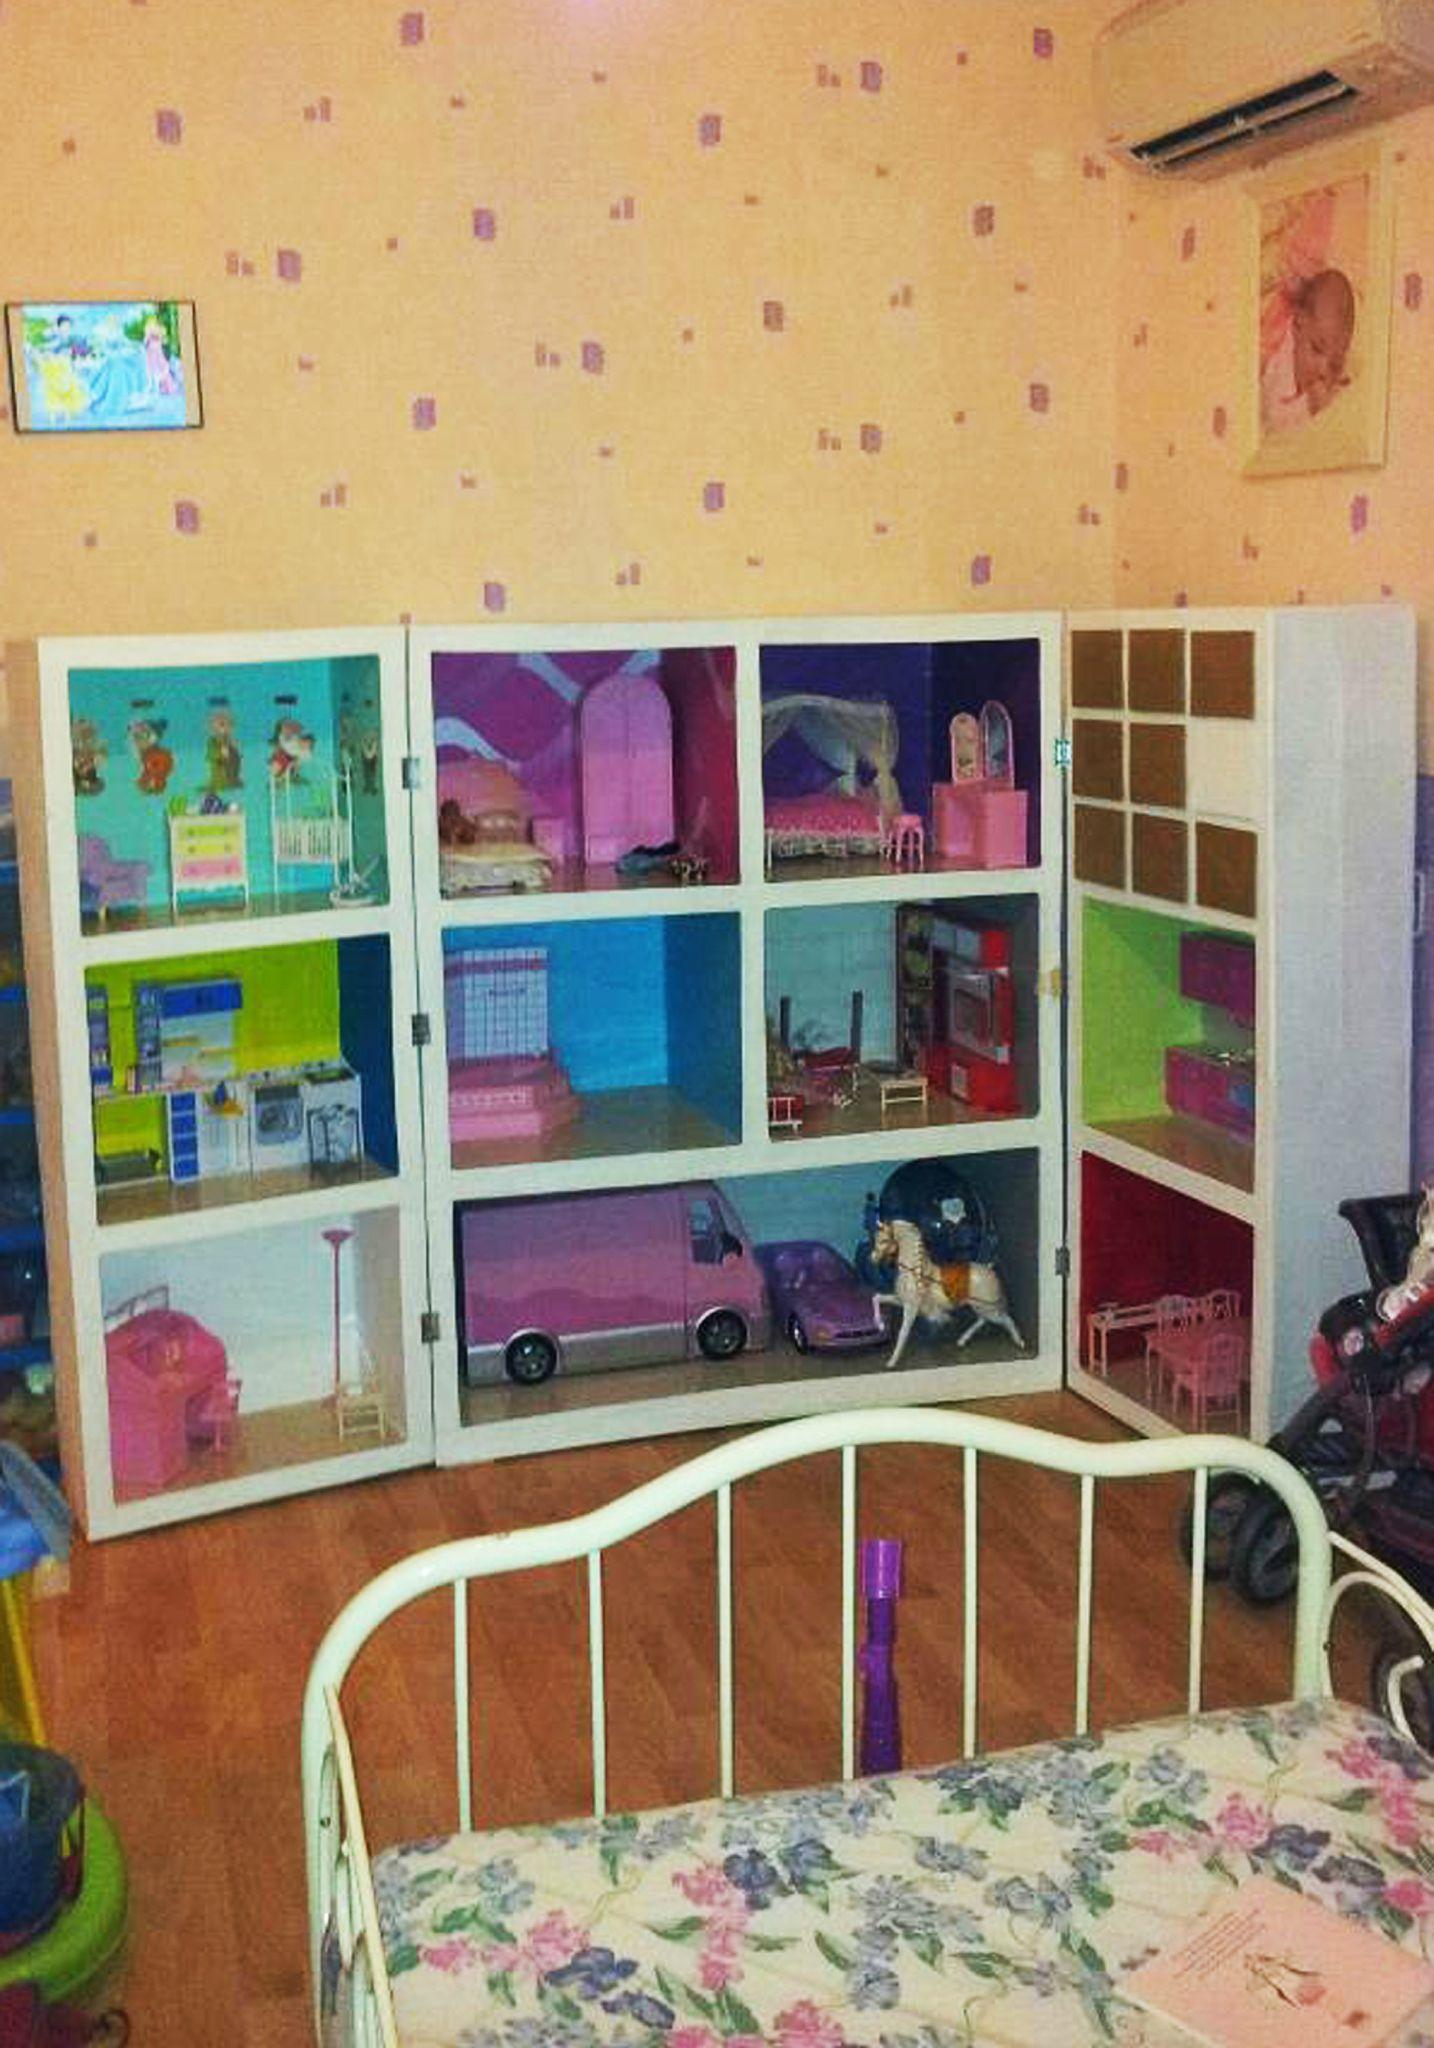 Photo maison barbie finie 8 little house mu ecas casas de mu ecas et casas - Fabrication maison en carton ...